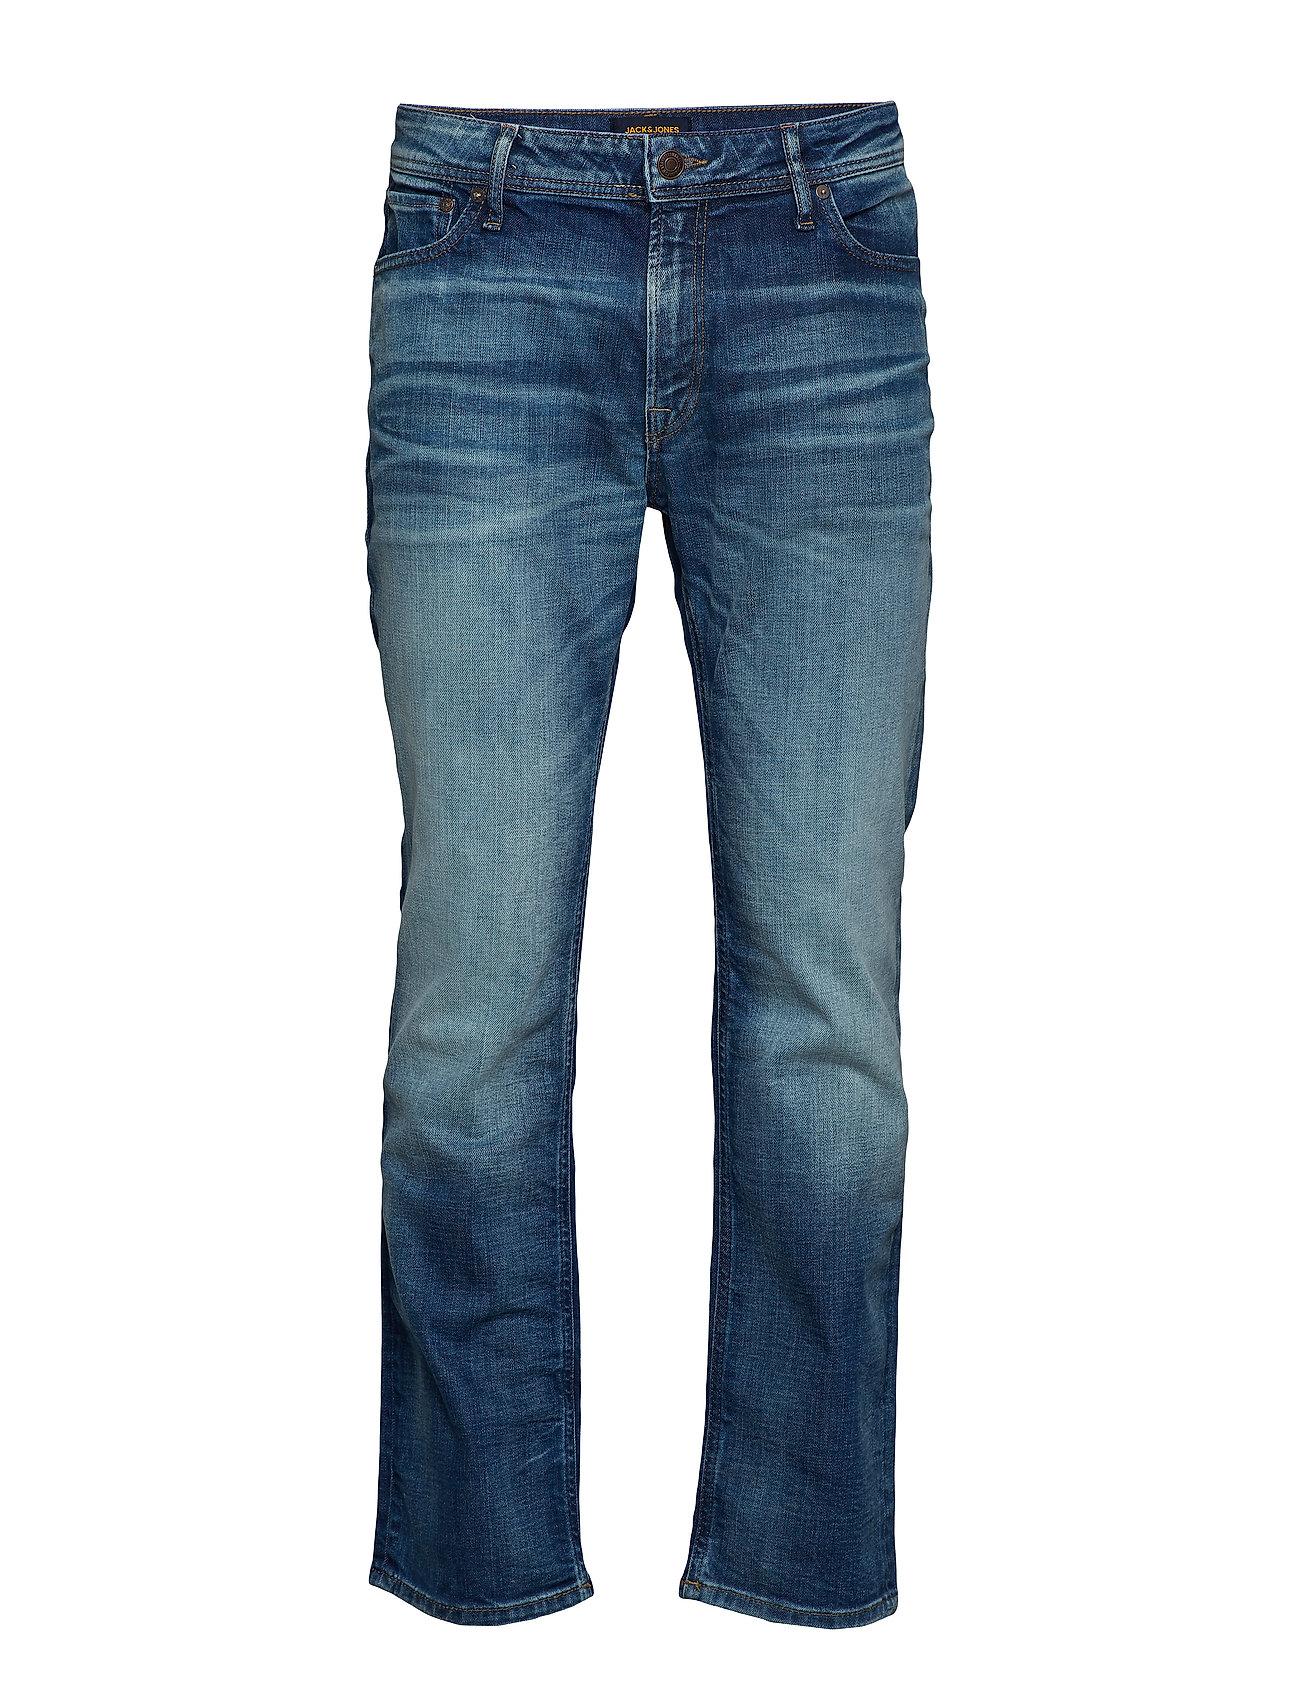 Jack & Jones JJICLARK JJORIGINAL JOS 178 NOOS Jeans